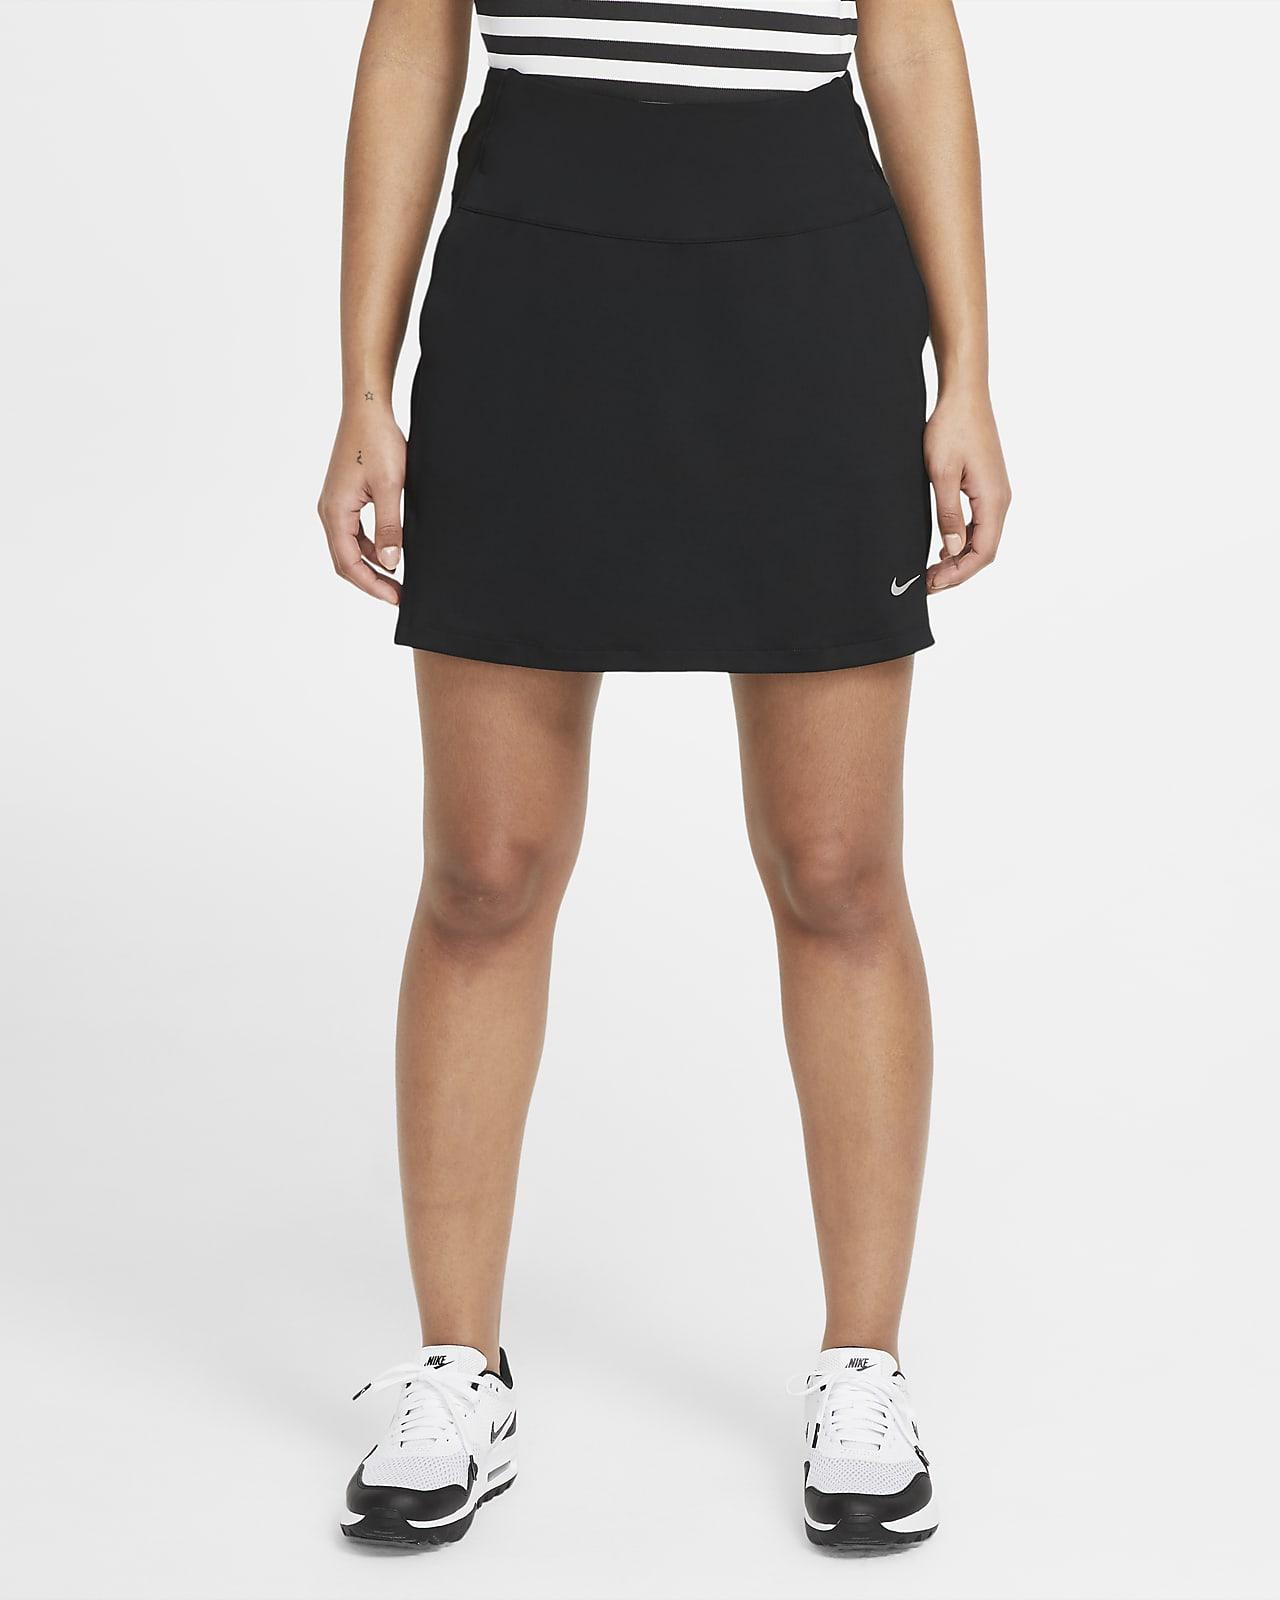 Nike Dri-FIT UV Victory női golfszoknya